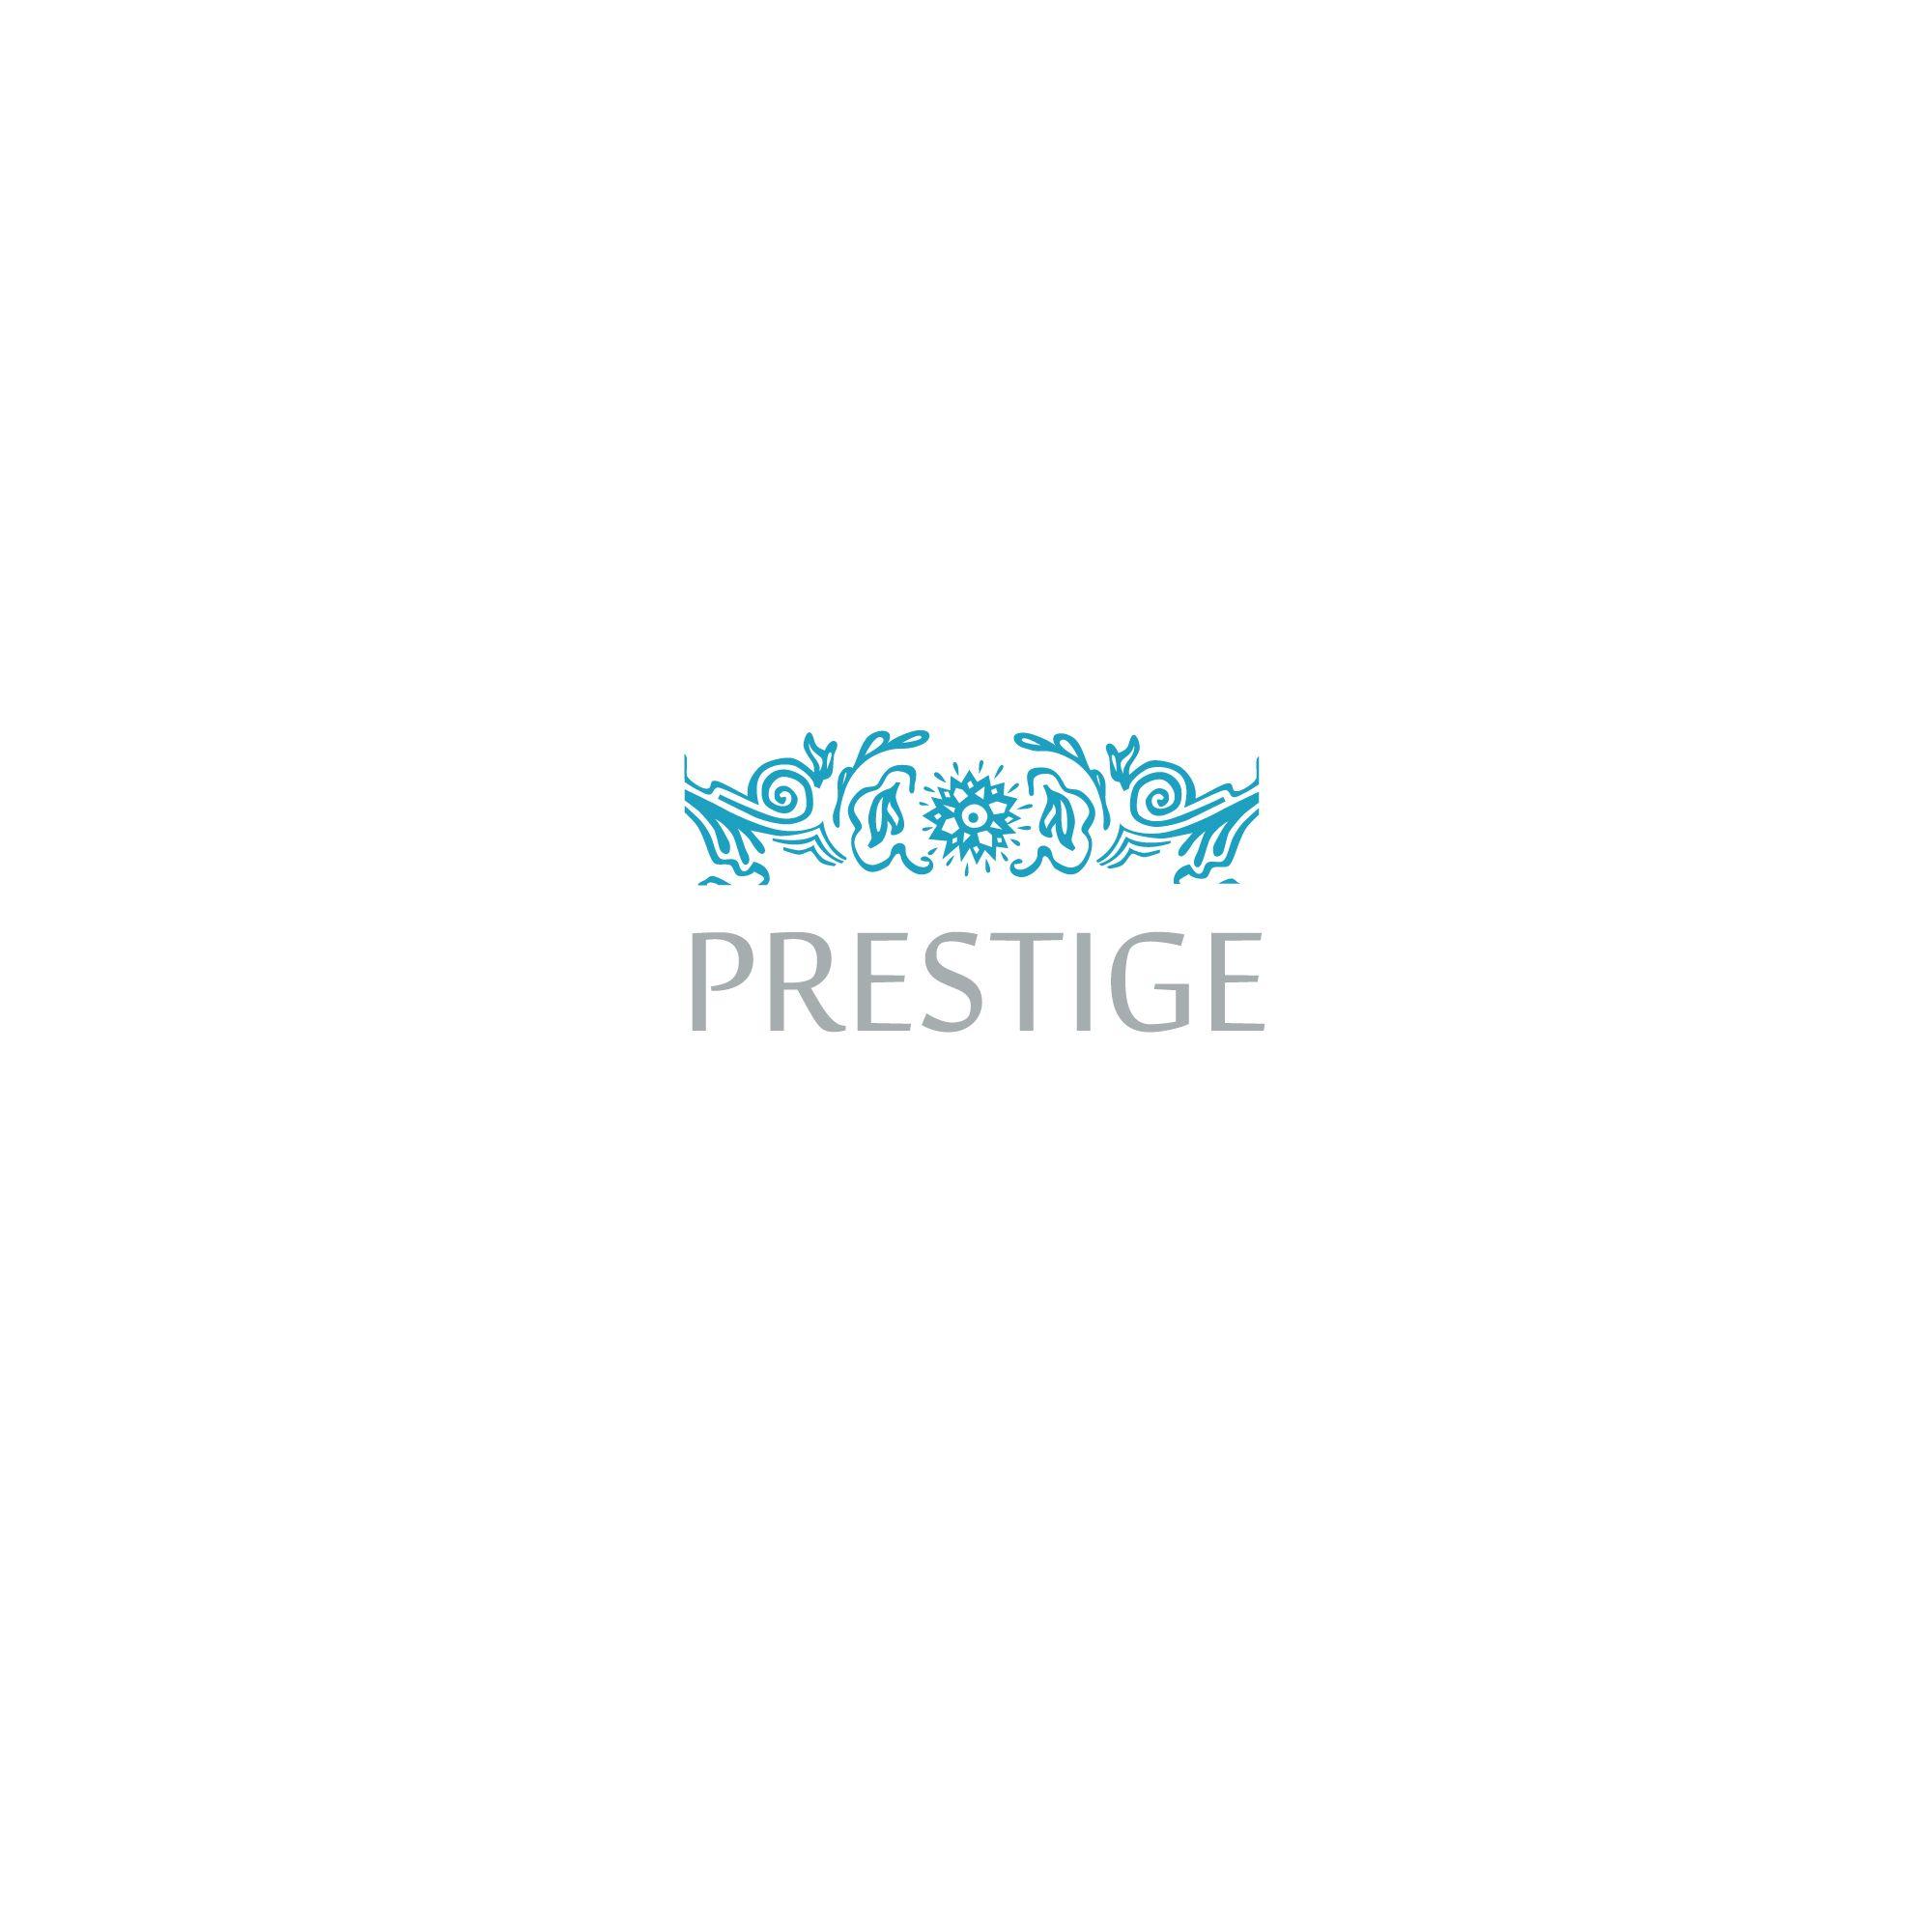 Логотип для свадебного агентства Prestige - дизайнер kirpichka